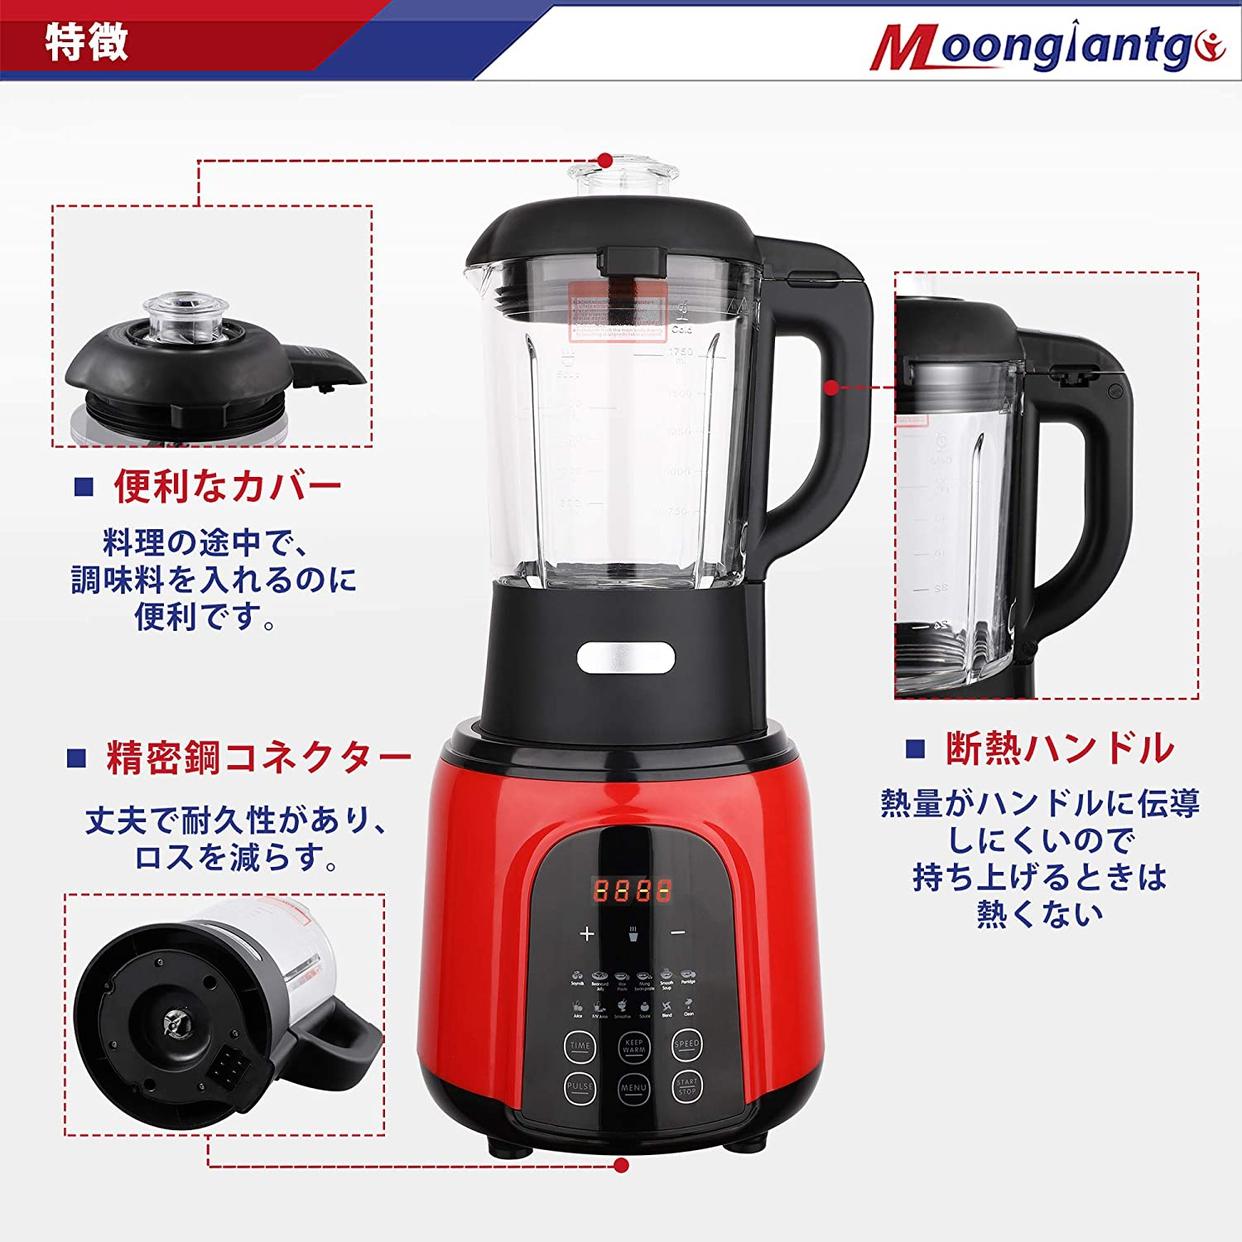 Moongiantgo(ムーンジャイアントゴー) 豆乳機 多機能調理器の商品画像6